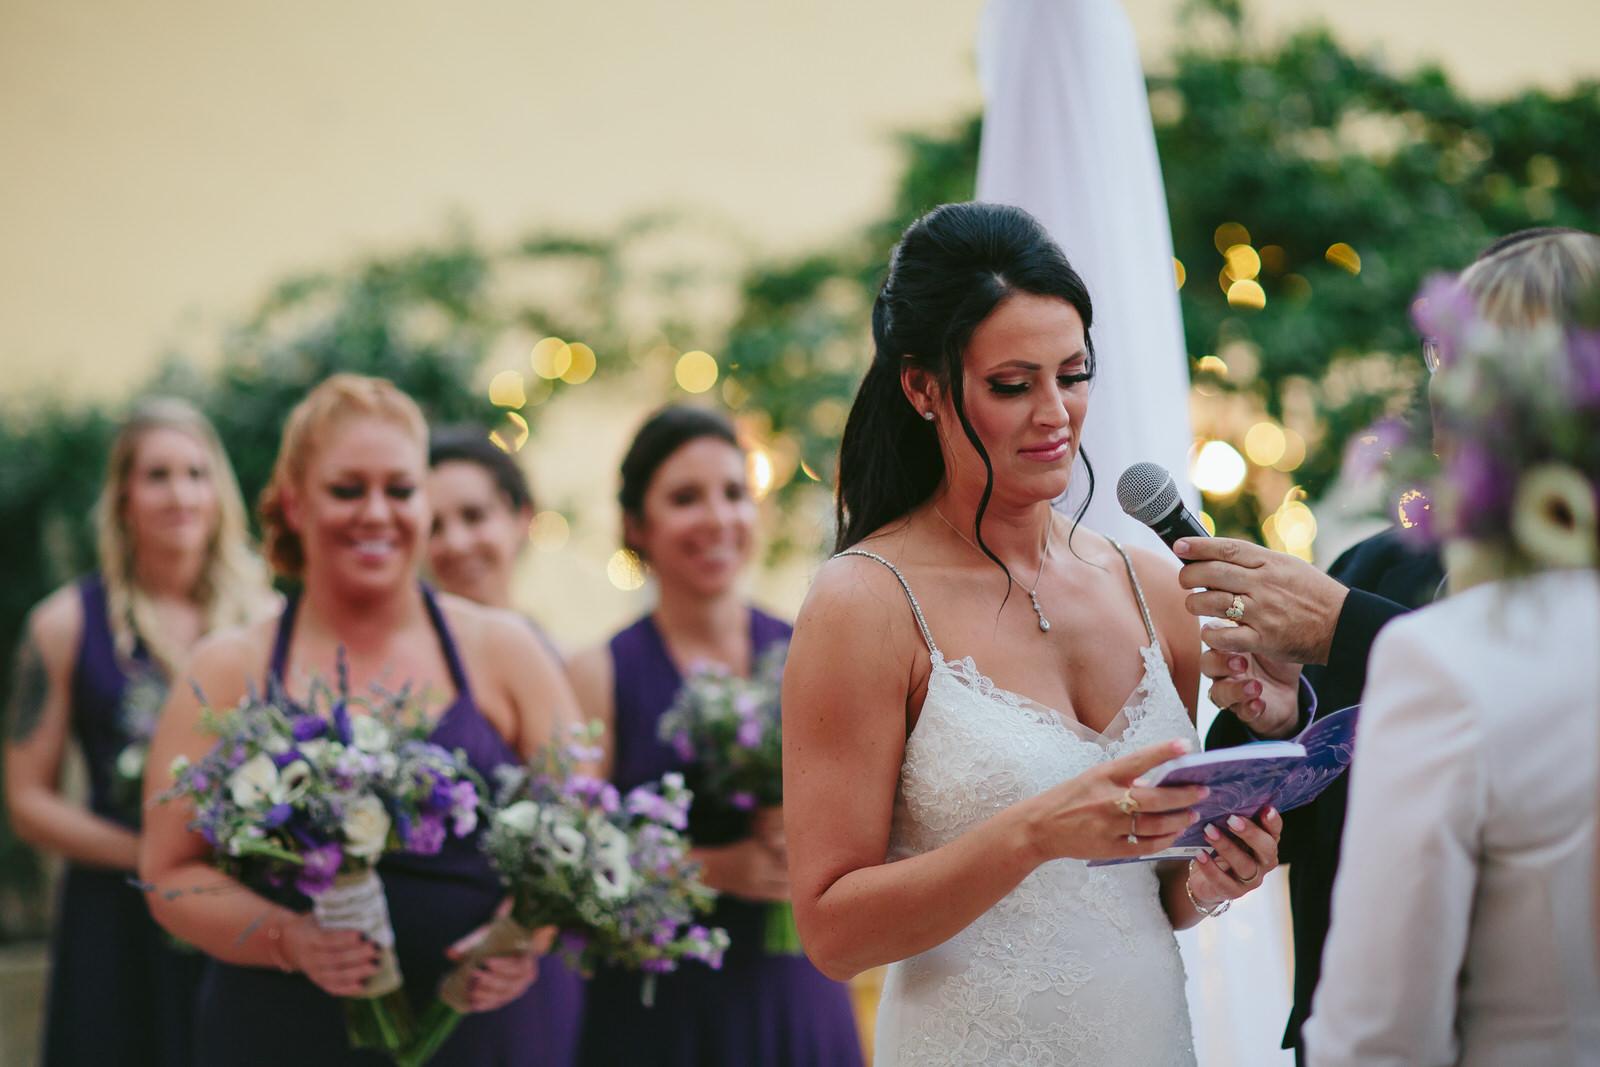 meaningful_moments_tiny_house_photo_weddings.jpg